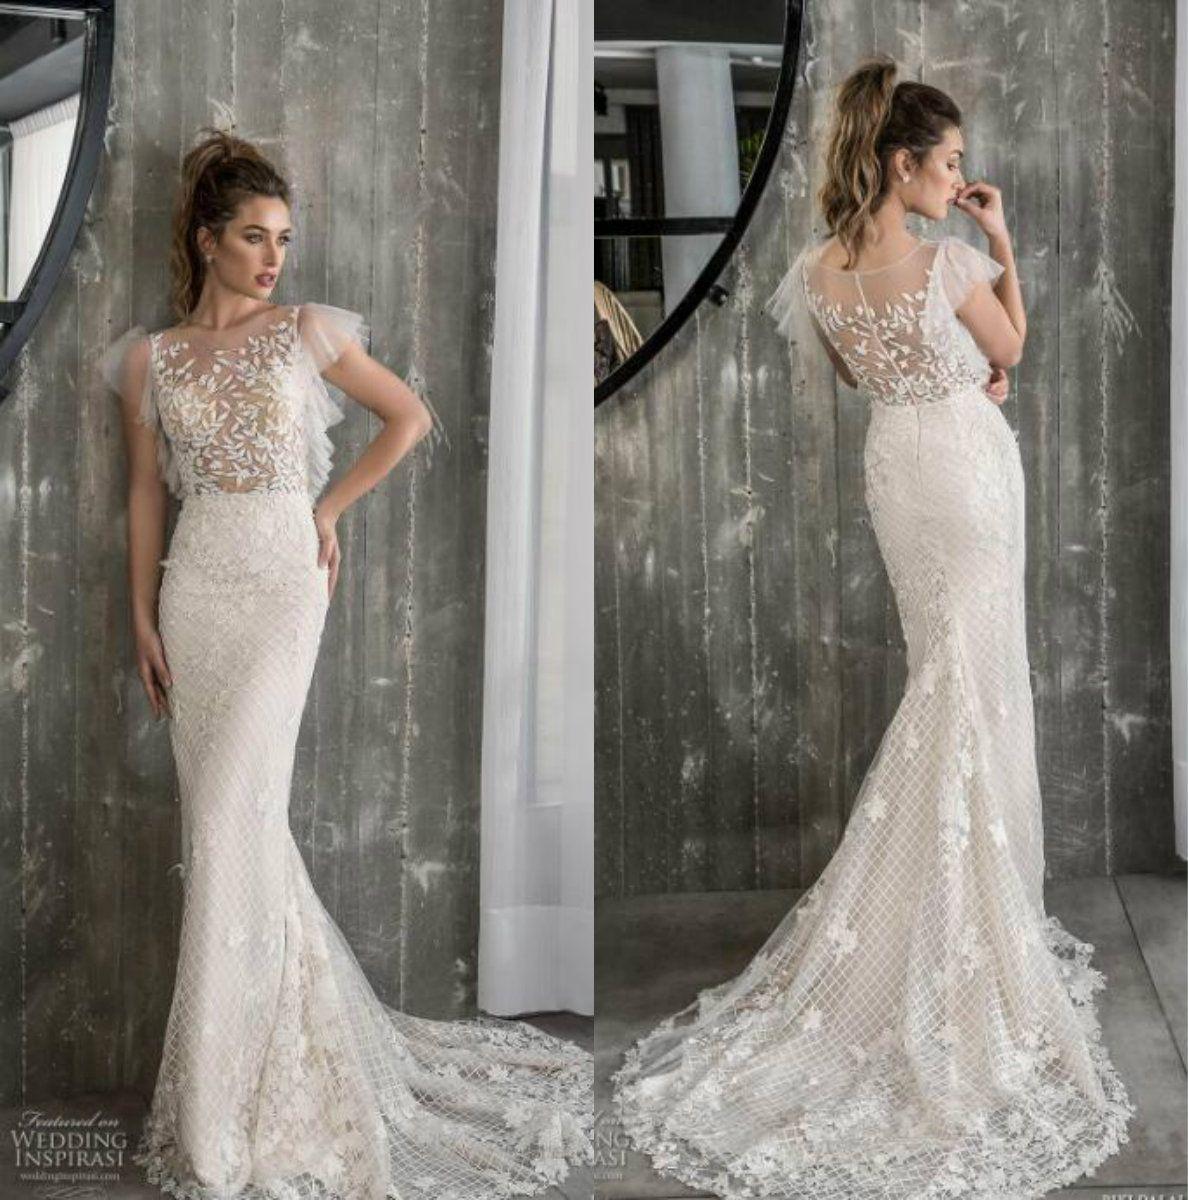 Riki Dalal Mermaid Lace Wedding Dresses Sheer Neck Illusion Bridal Gowns Sweep Train Vestido De Novia Fishnet Wedding Gowns Bridal Party Dresses